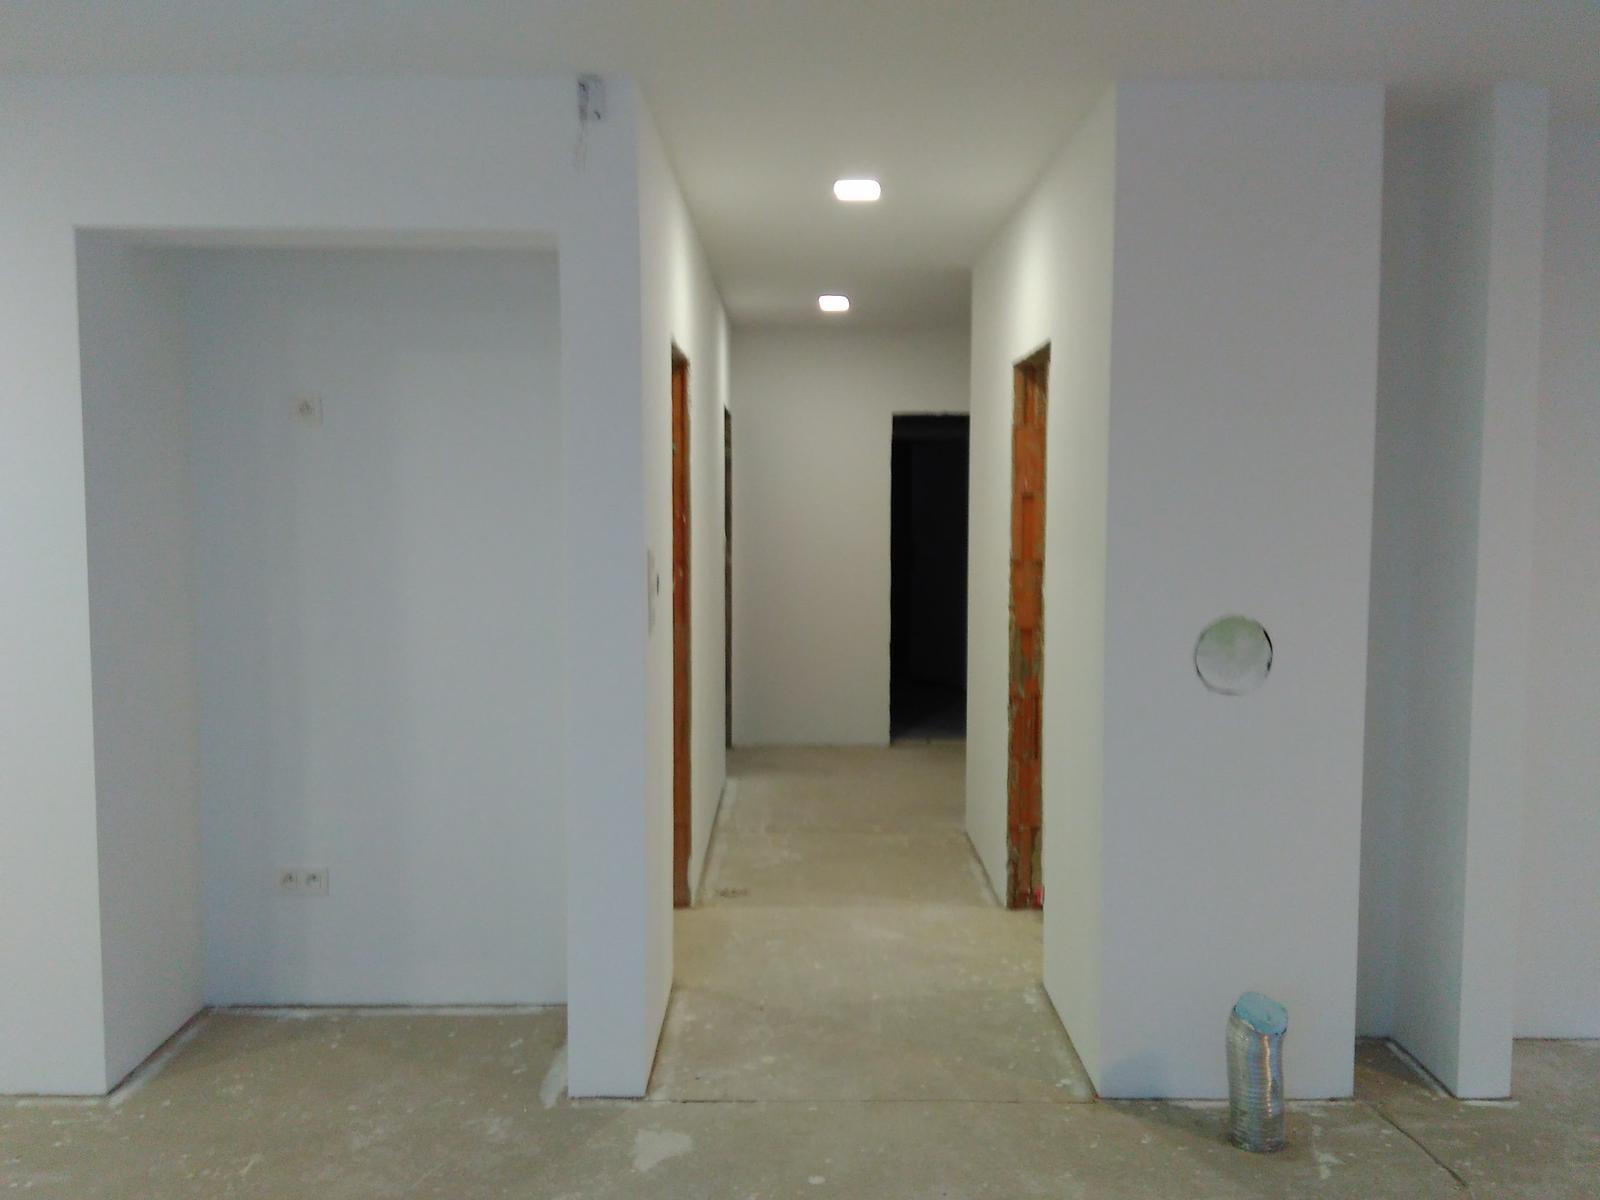 Dom LM - Obrázok č. 104